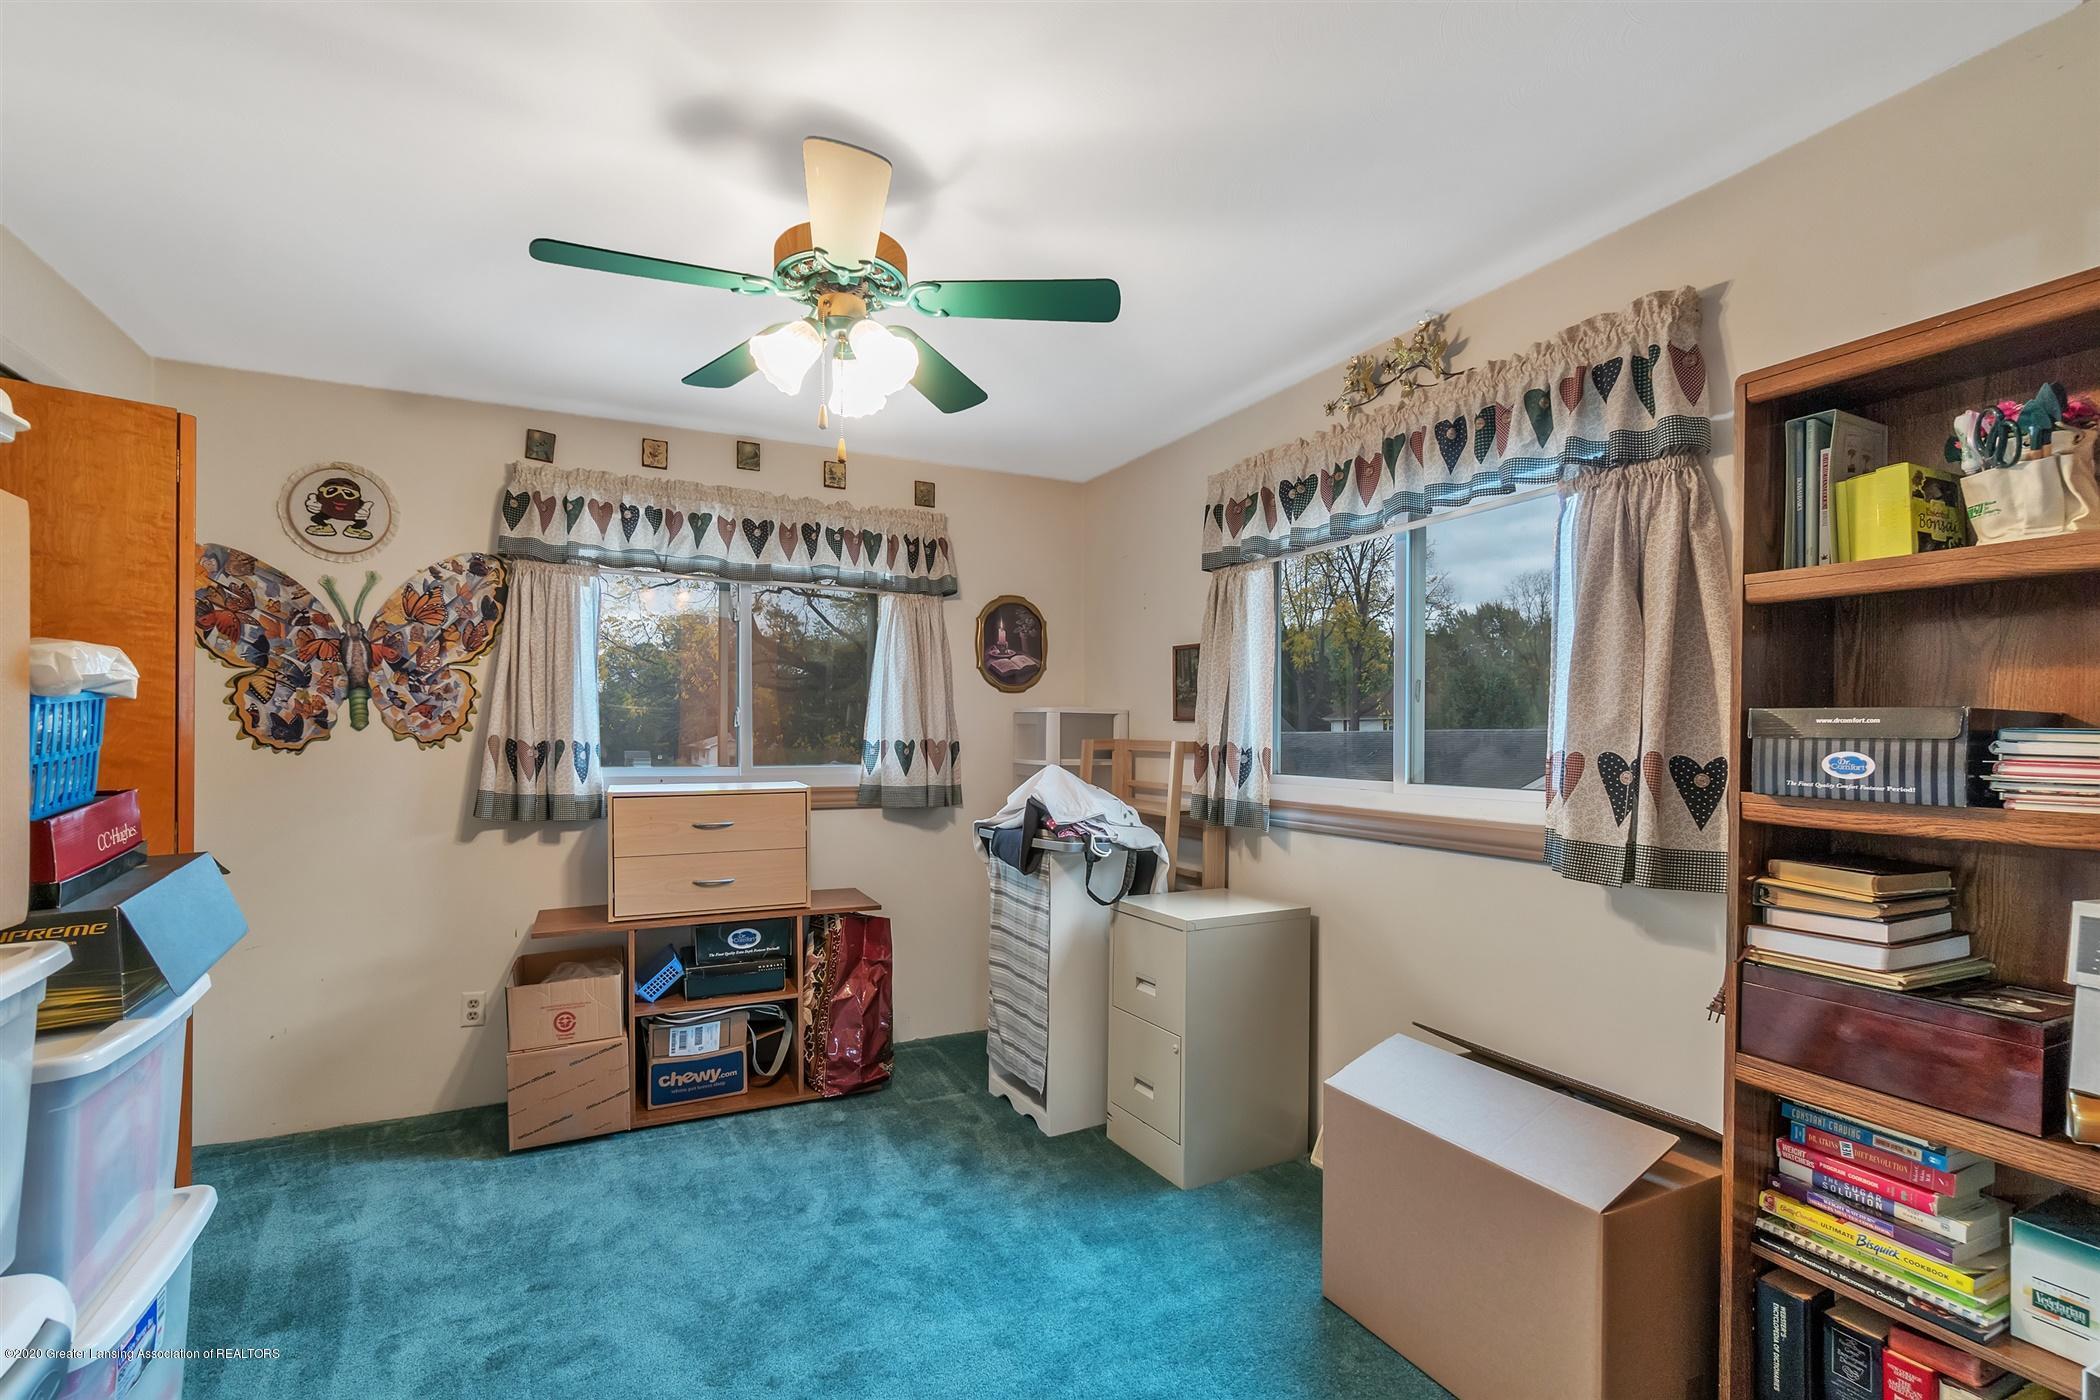 4385 Holt Rd - 51-4385 Holt Rd.-WindowStill-Real-E - 51